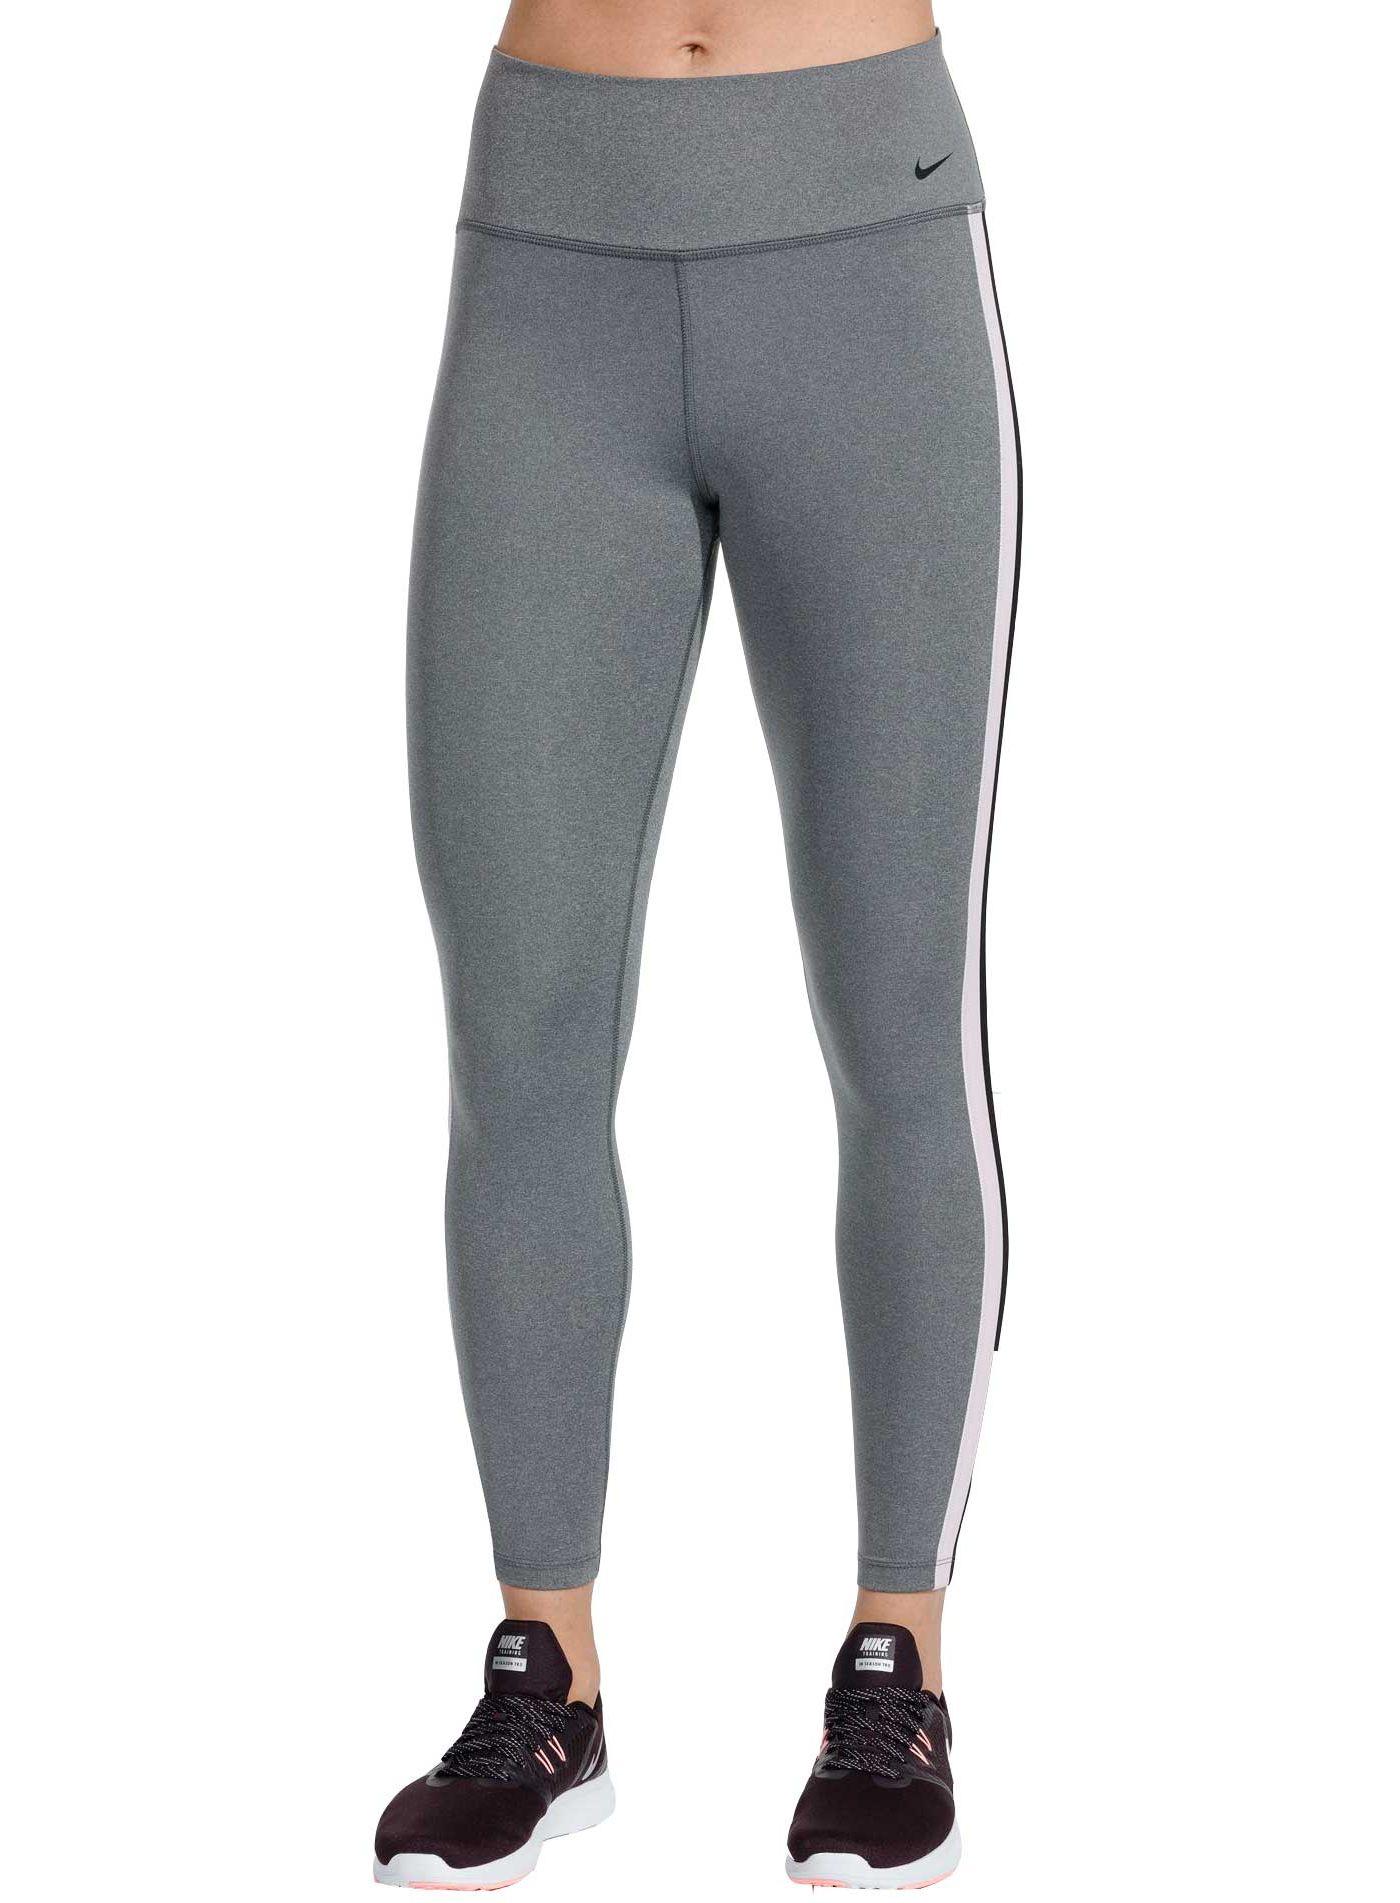 Nike One Women's Power 7/8 Training Tights